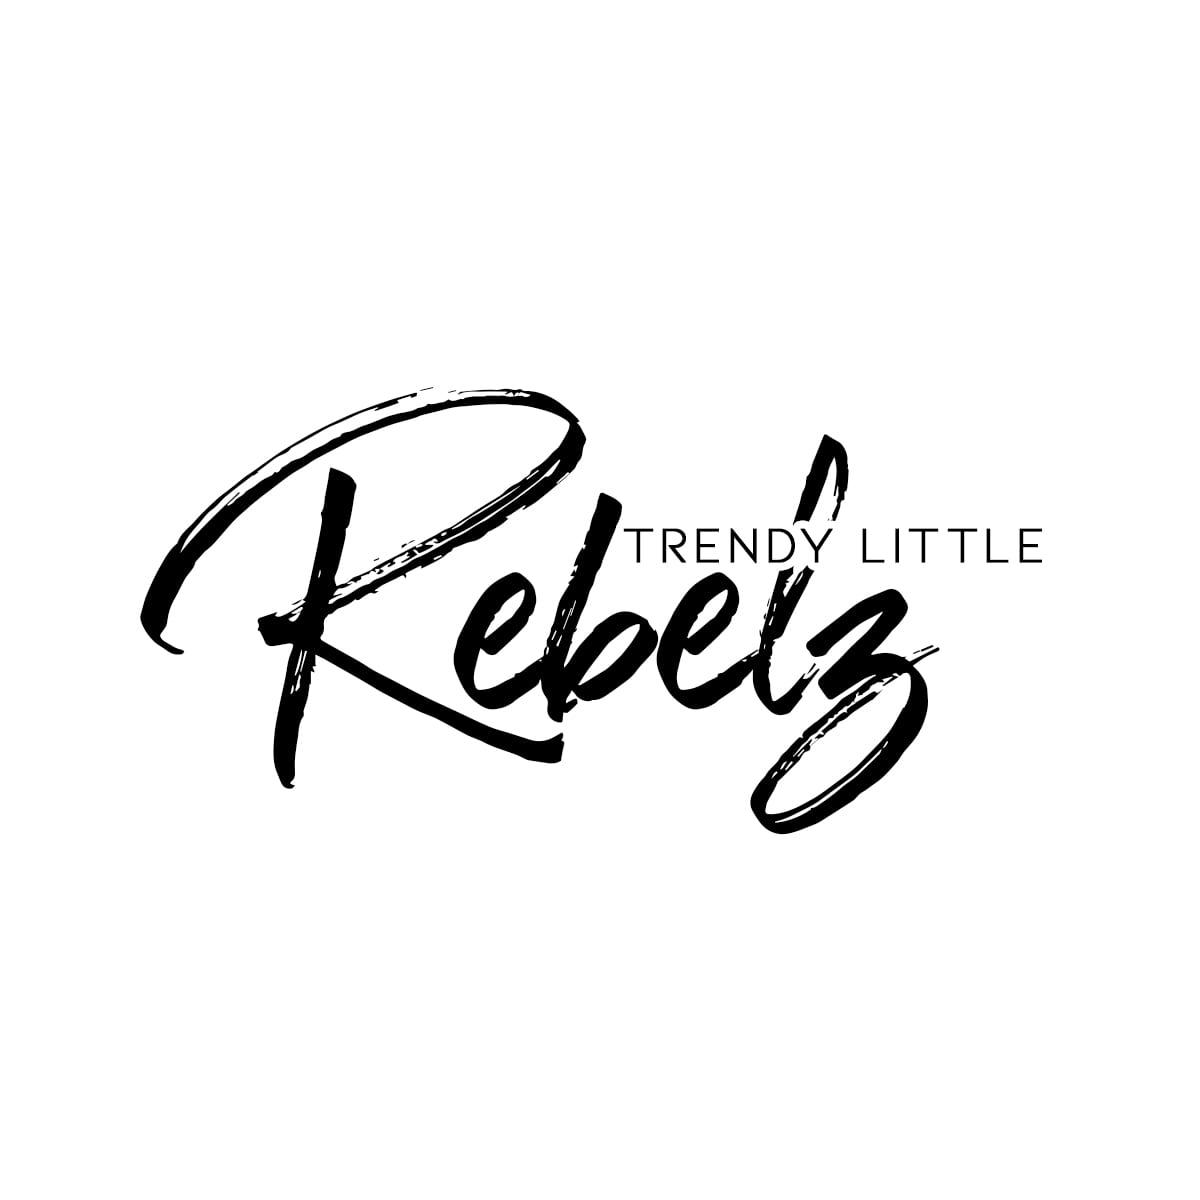 Trendy-Little-Rebels-Logo-007-No-Girlz-Final_FB_Profile